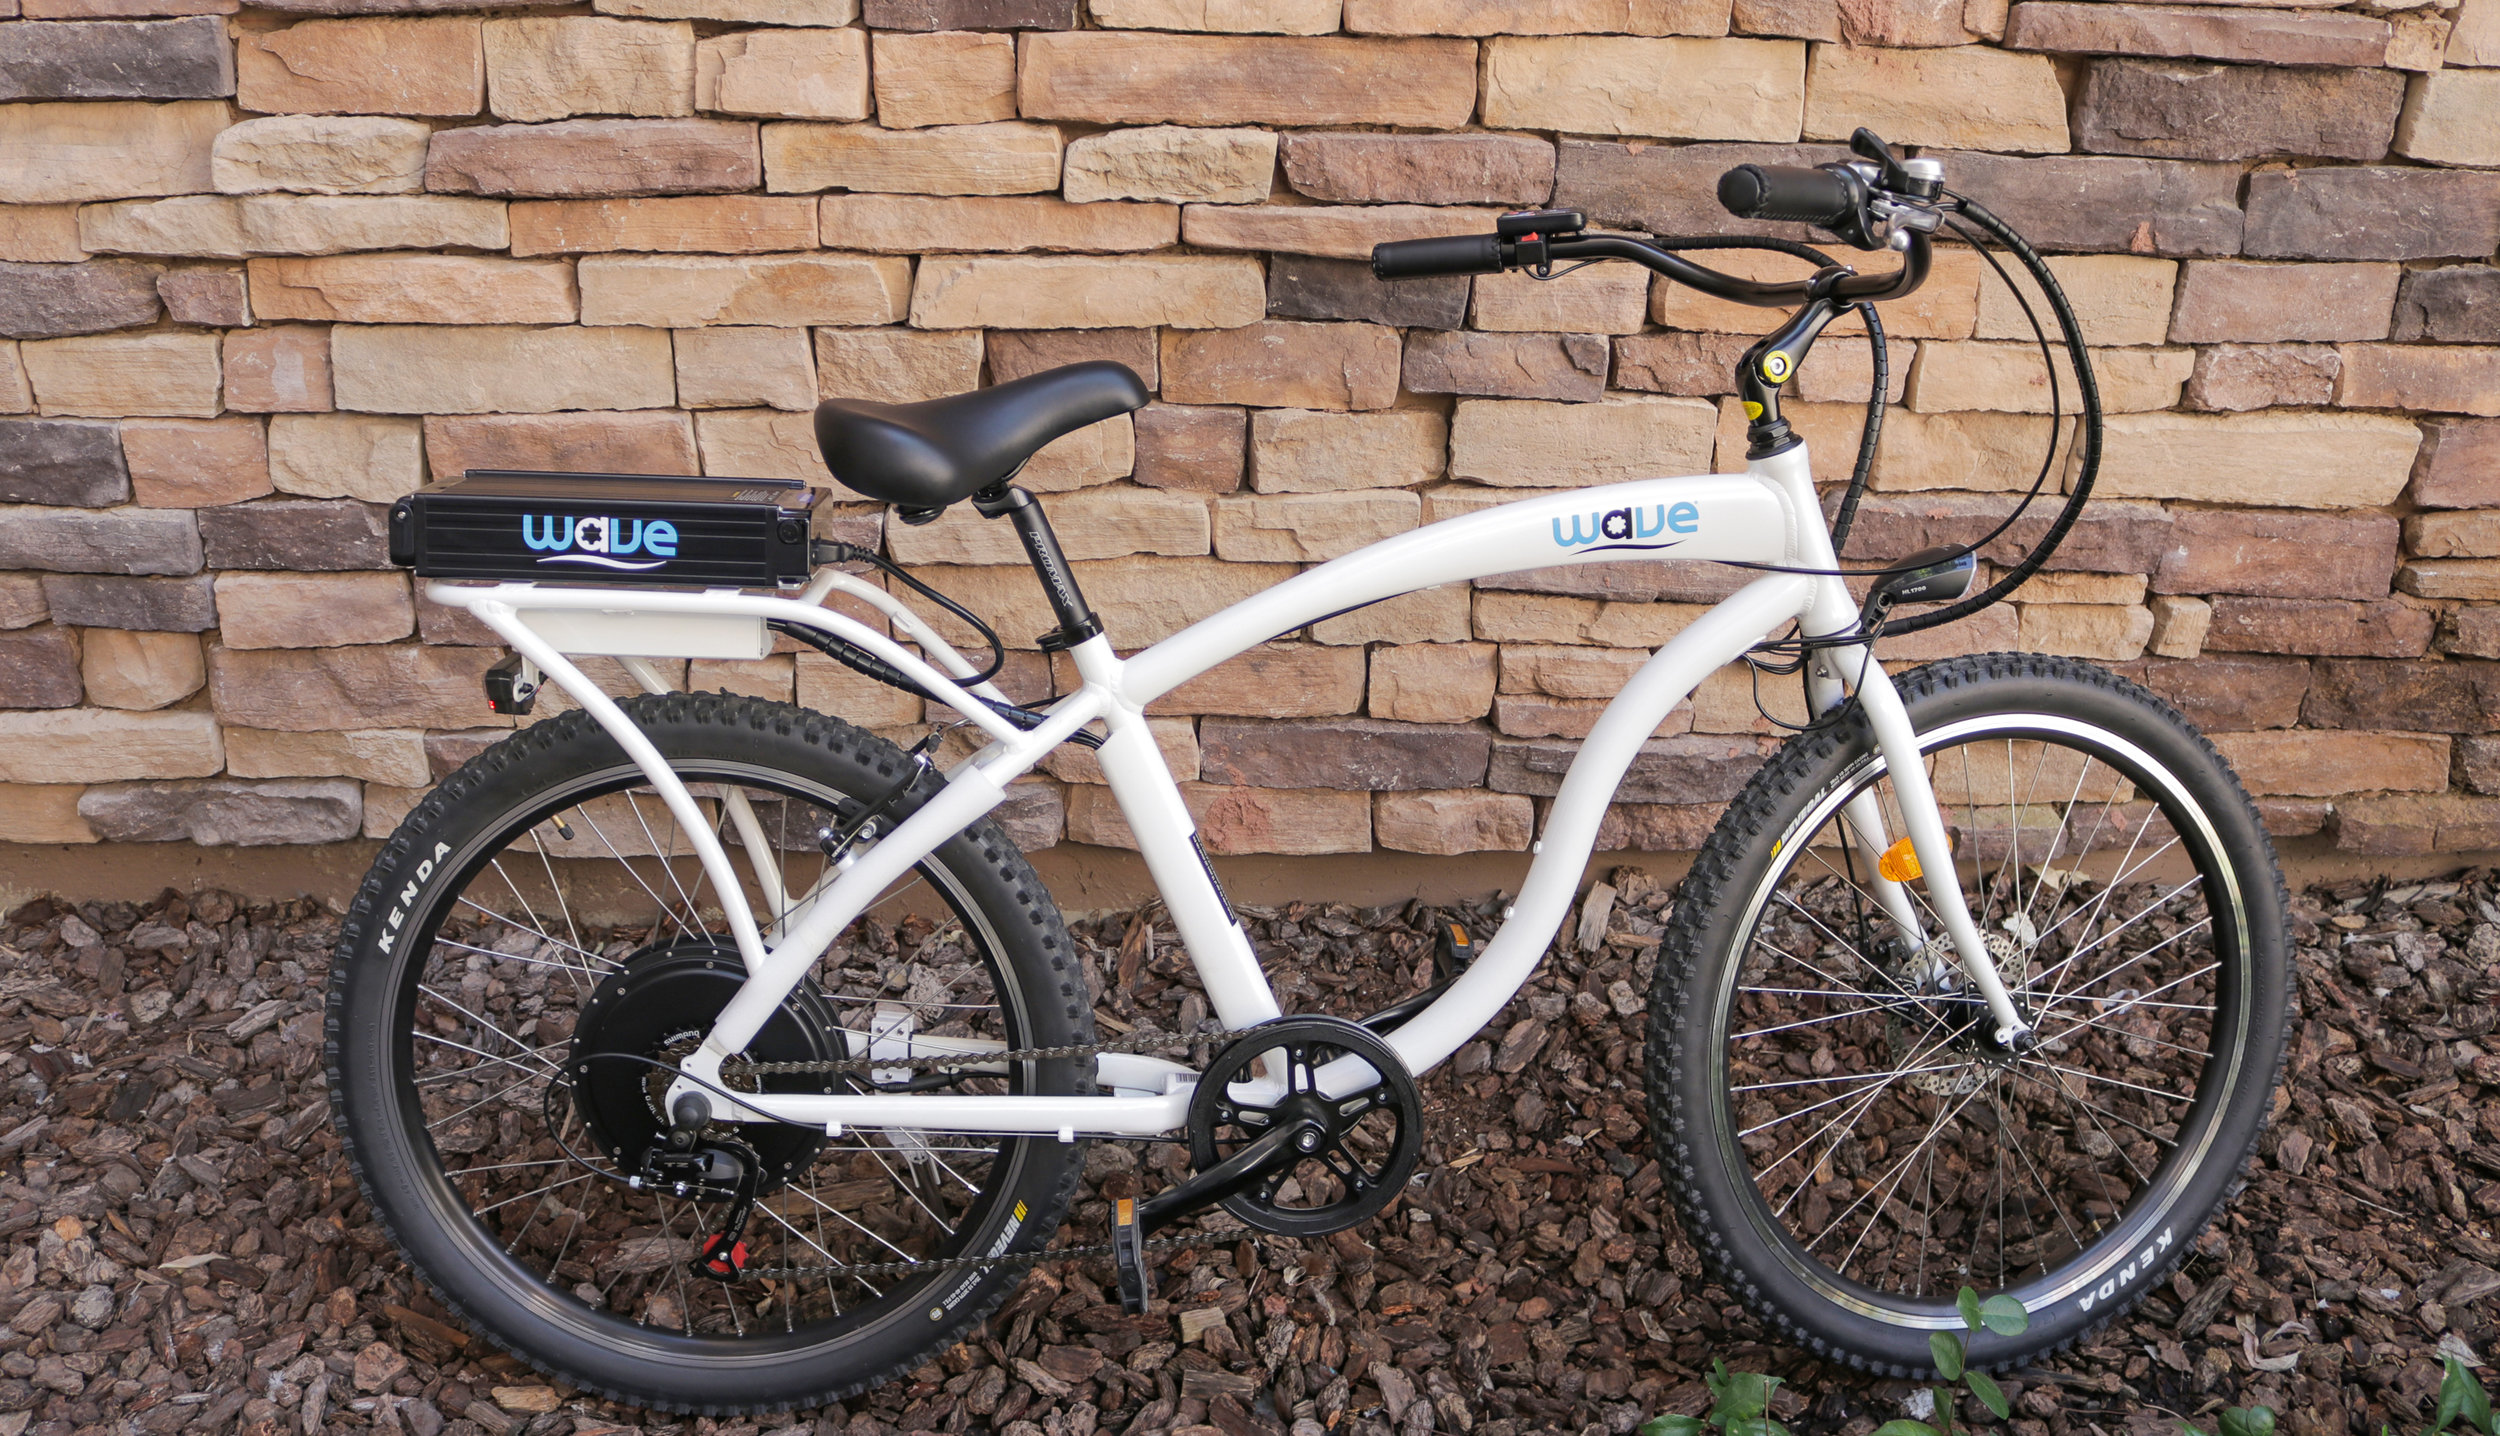 electrified-reviews-wave-electric-bike-review-profile-3.jpg